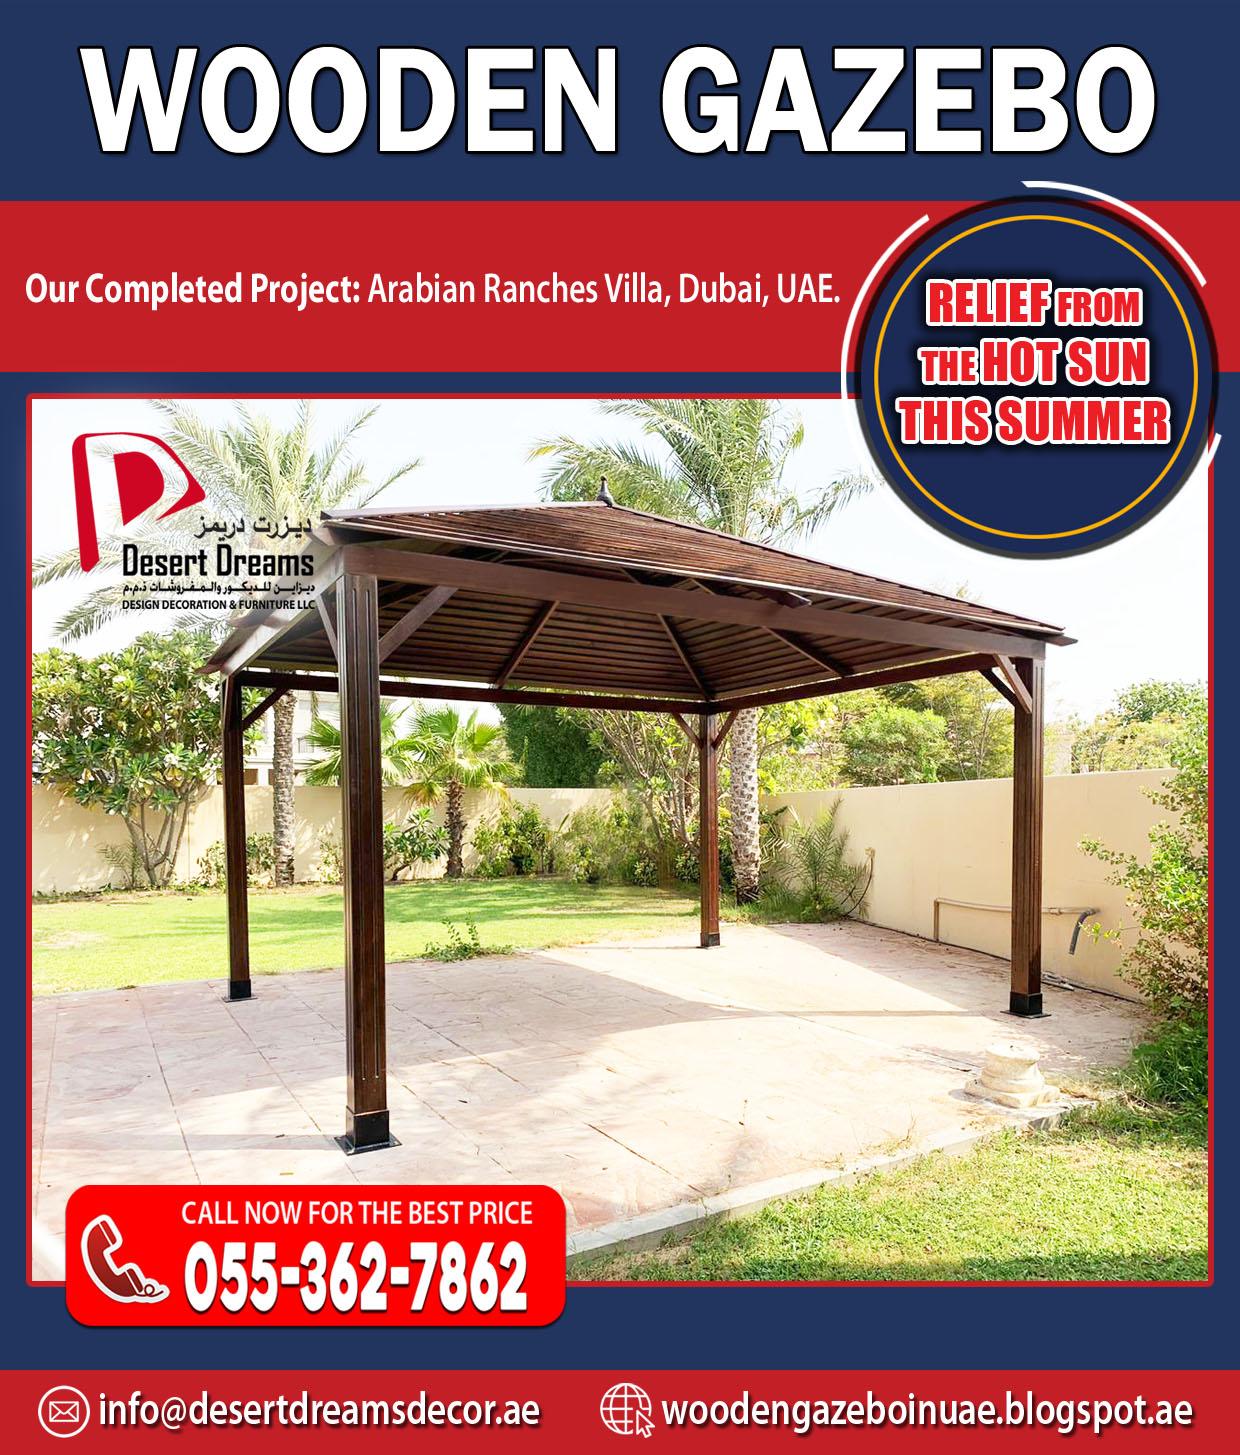 Wooden Gazebo in Dubai, UAE-1.jpg